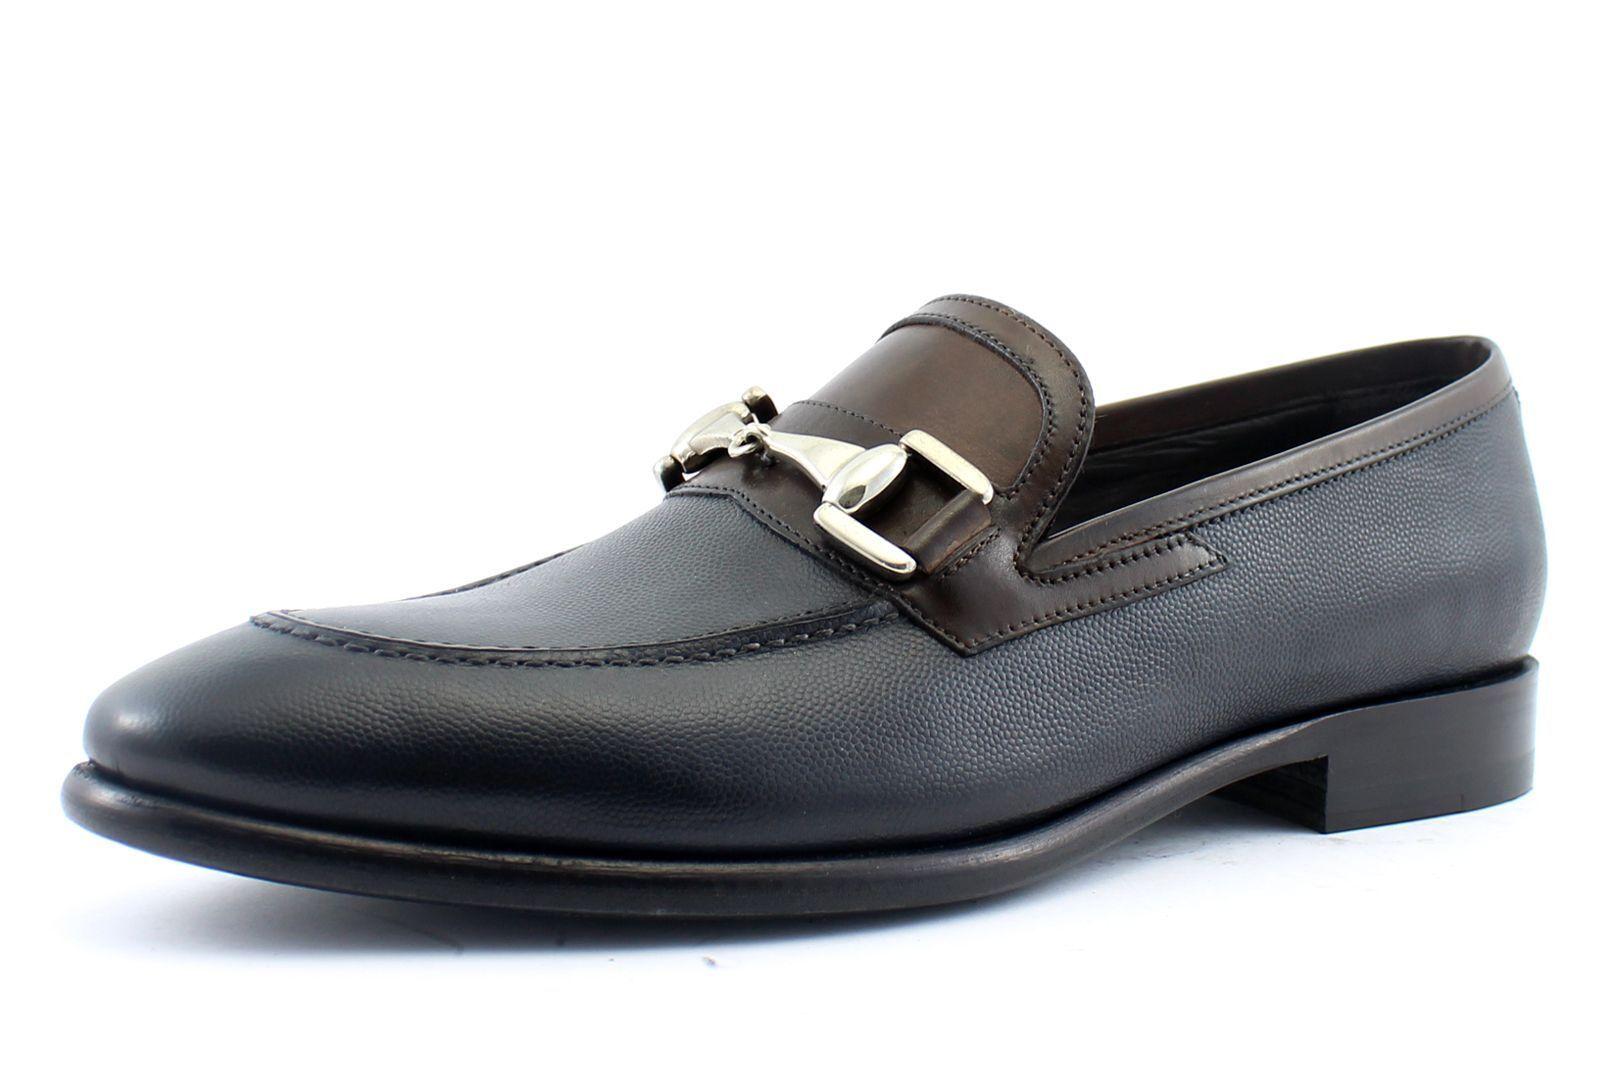 Men scarpe leather Italian Giorgio Rea US 7 8 9 10 11 12 moda derbies 07356BL